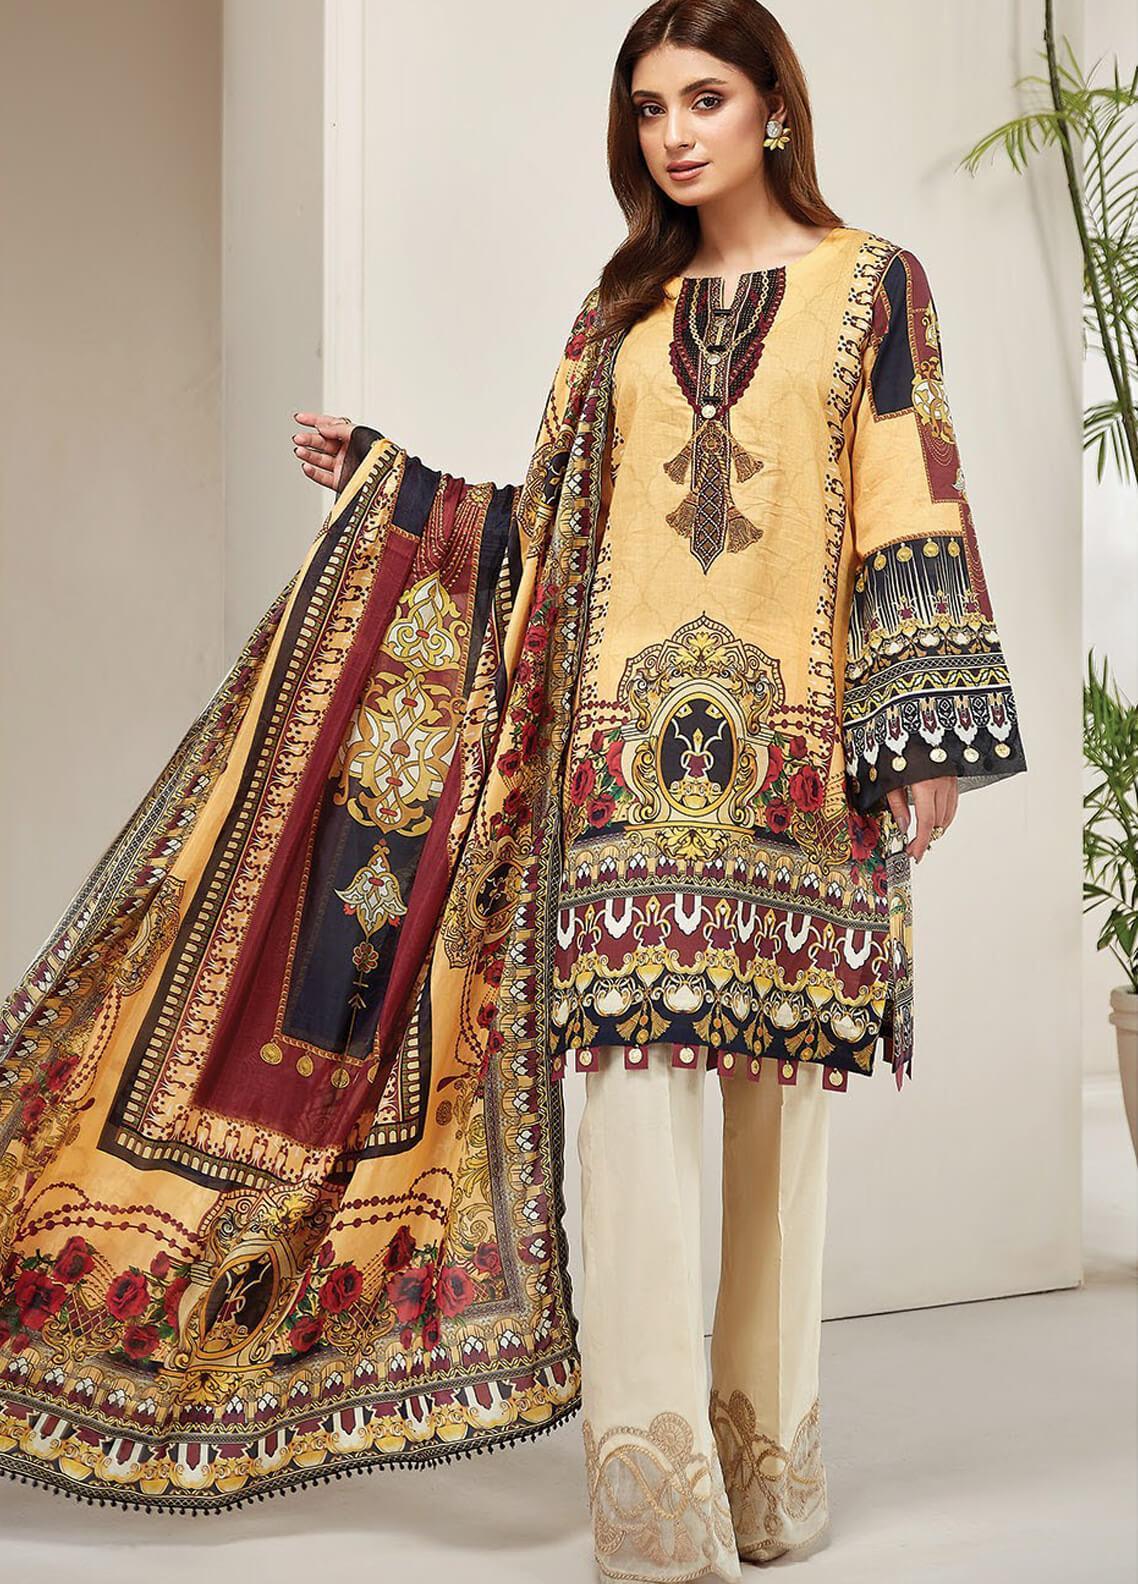 Farasha Embroidered Lawn Unstitched 3 Piece Suit FSH20L 05 PRIMROSE DREAM - Spring / Summer Collection